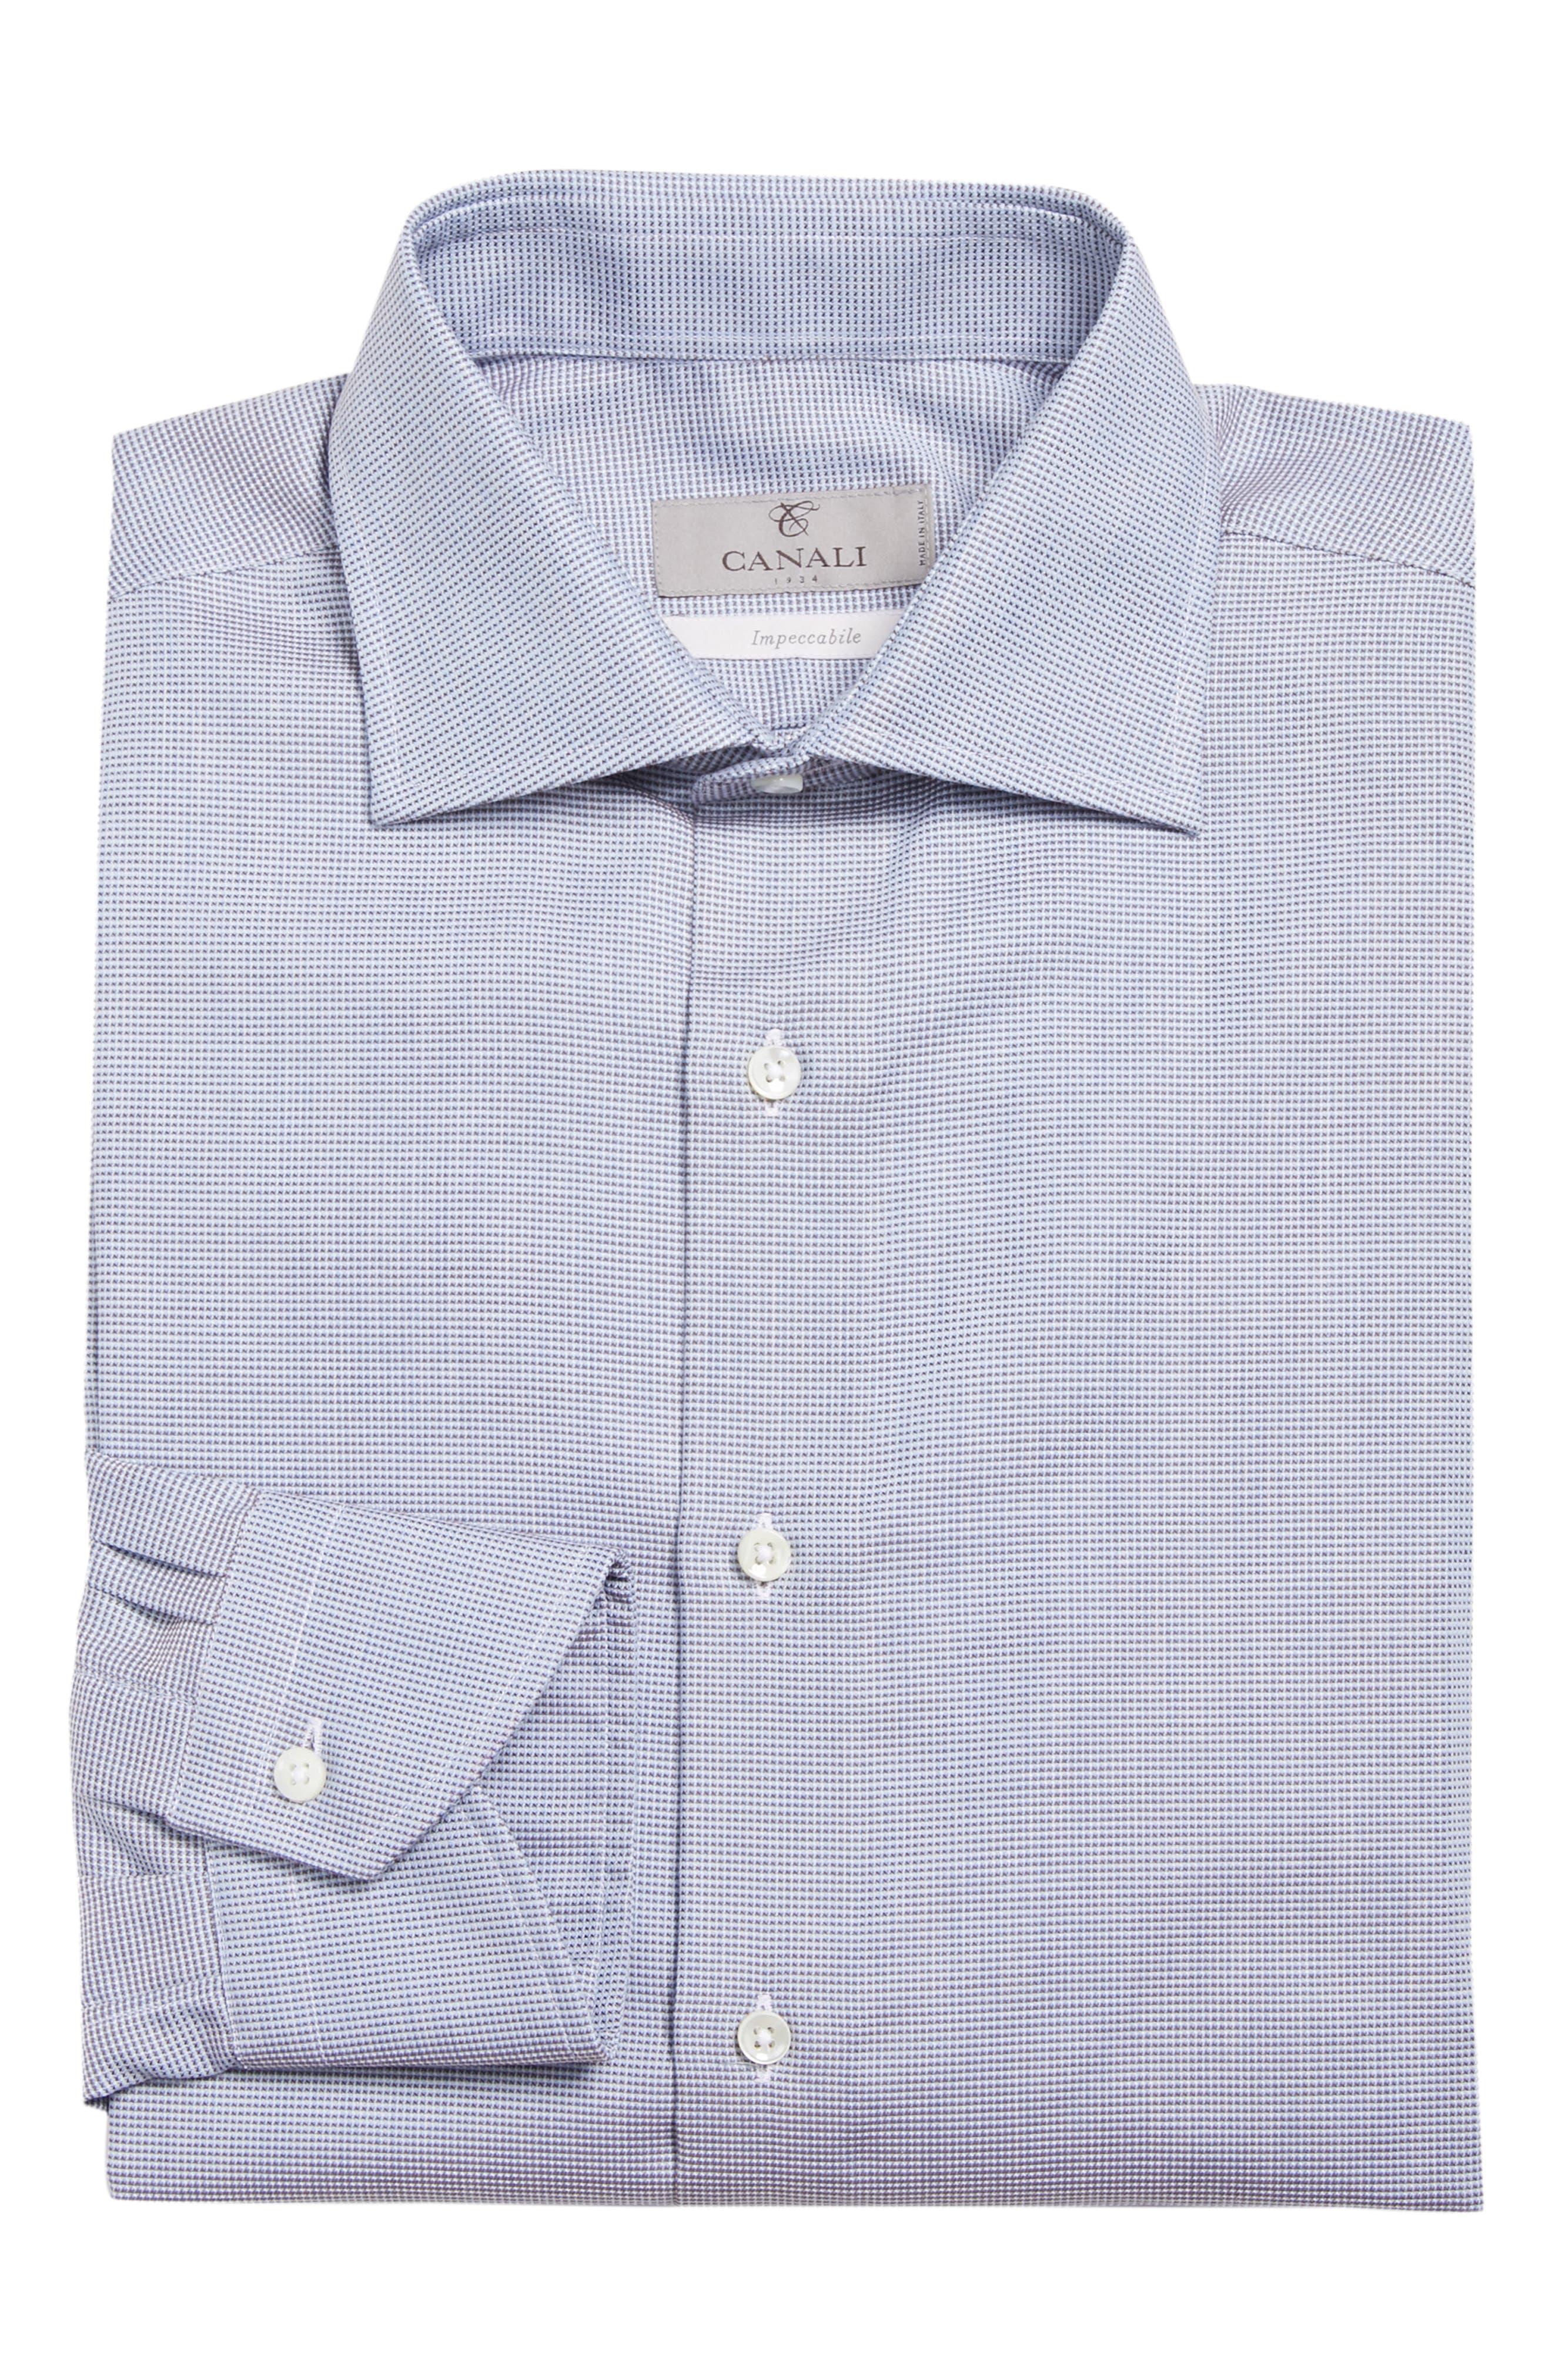 Regular Fit Solid Dress Shirt,                             Alternate thumbnail 6, color,                             Brown